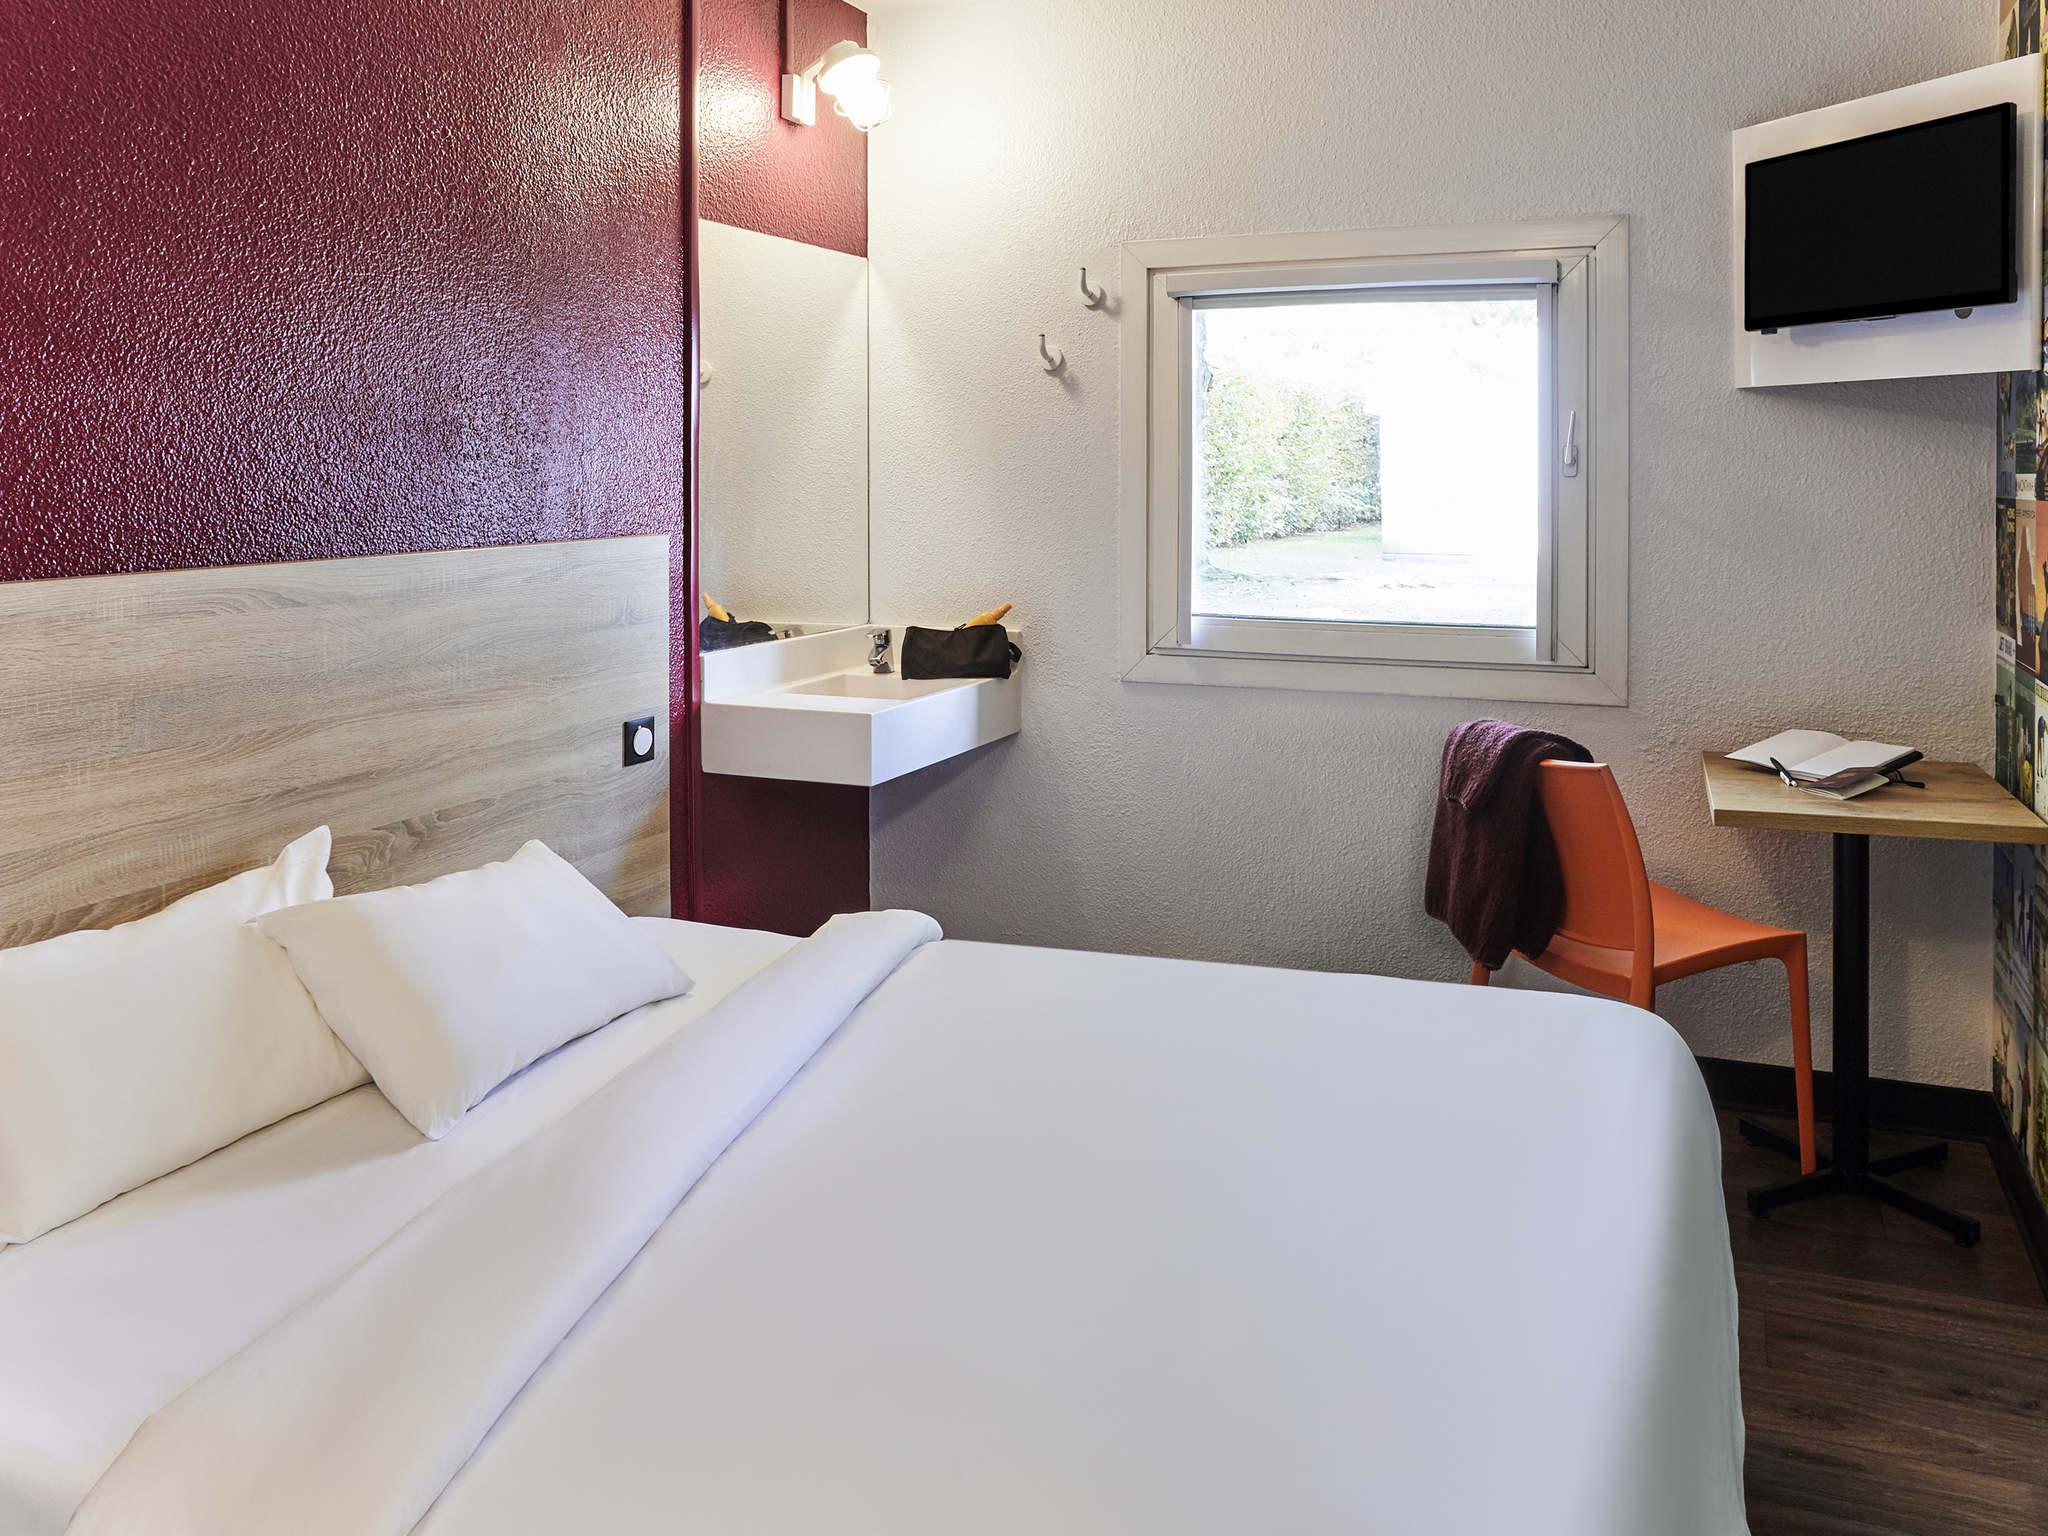 hotel in lormont hotelf1 bordeaux nord lormont. Black Bedroom Furniture Sets. Home Design Ideas